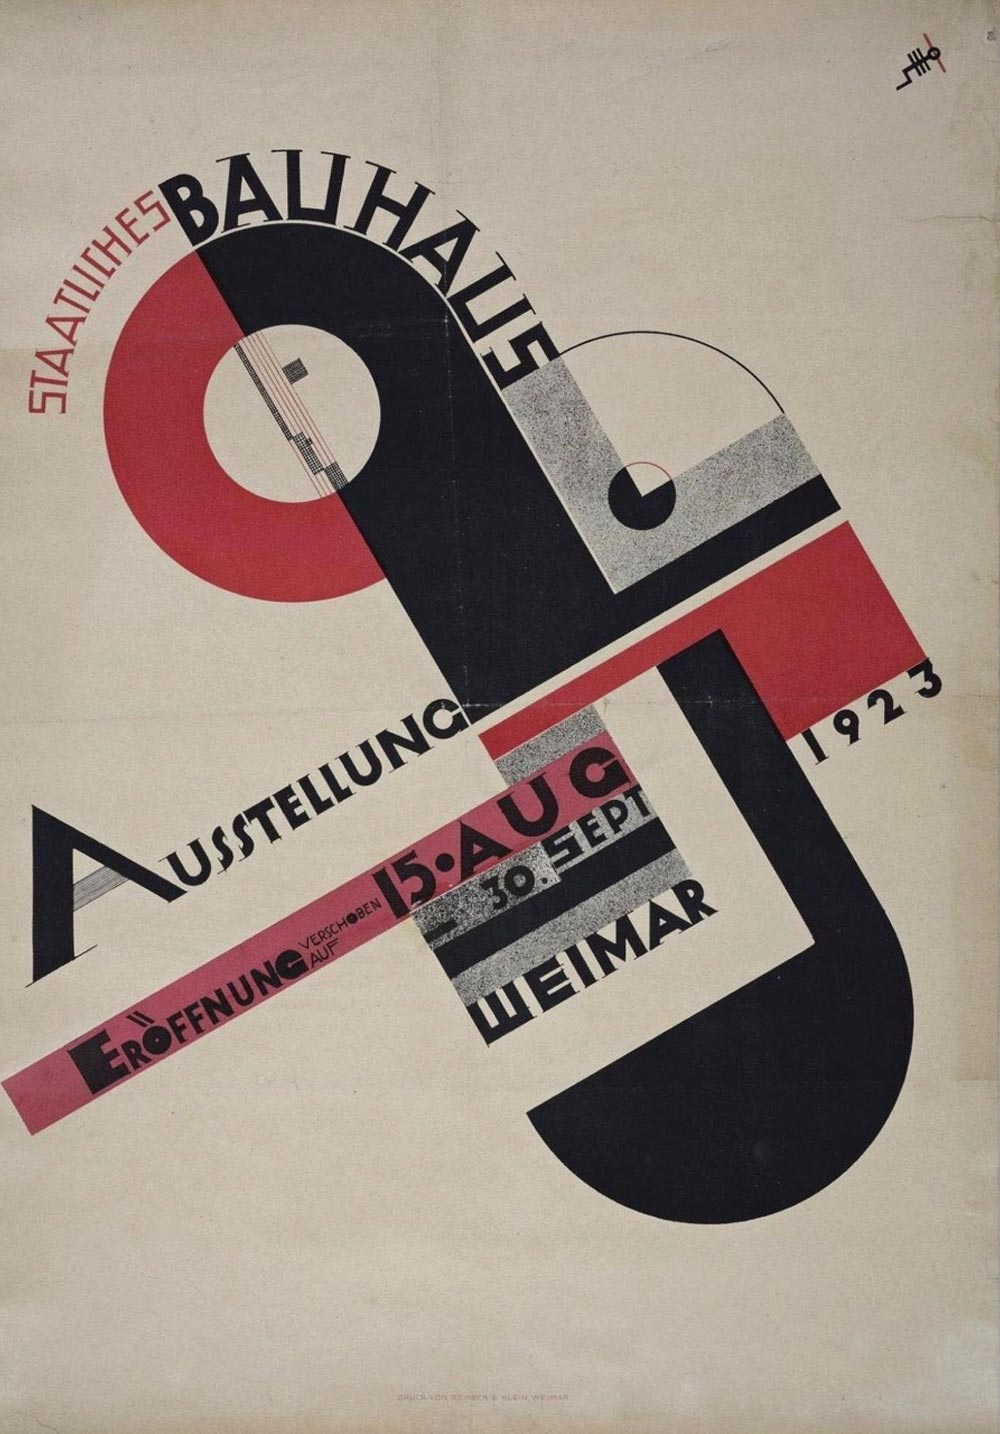 Poster for the Bauhausaustellung by Joost Schmidt (1923)